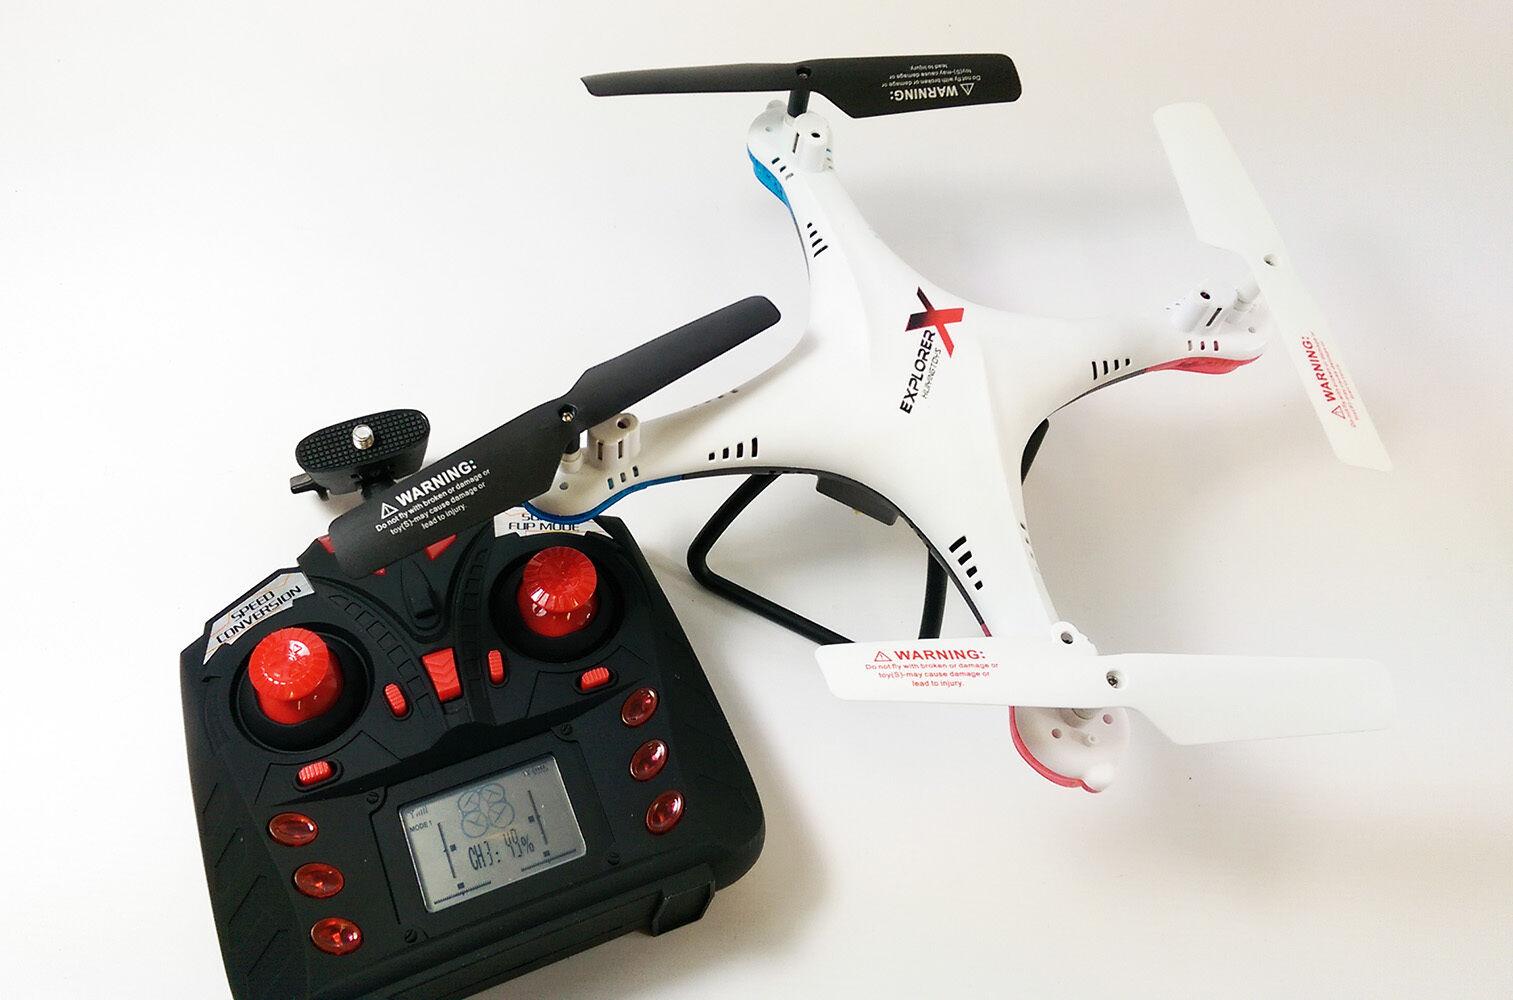 blancoo Wifi HD Cámara FPV exploradores en vivo RC Cuadricóptero Drone RTF OVNI Gyro 2.4G